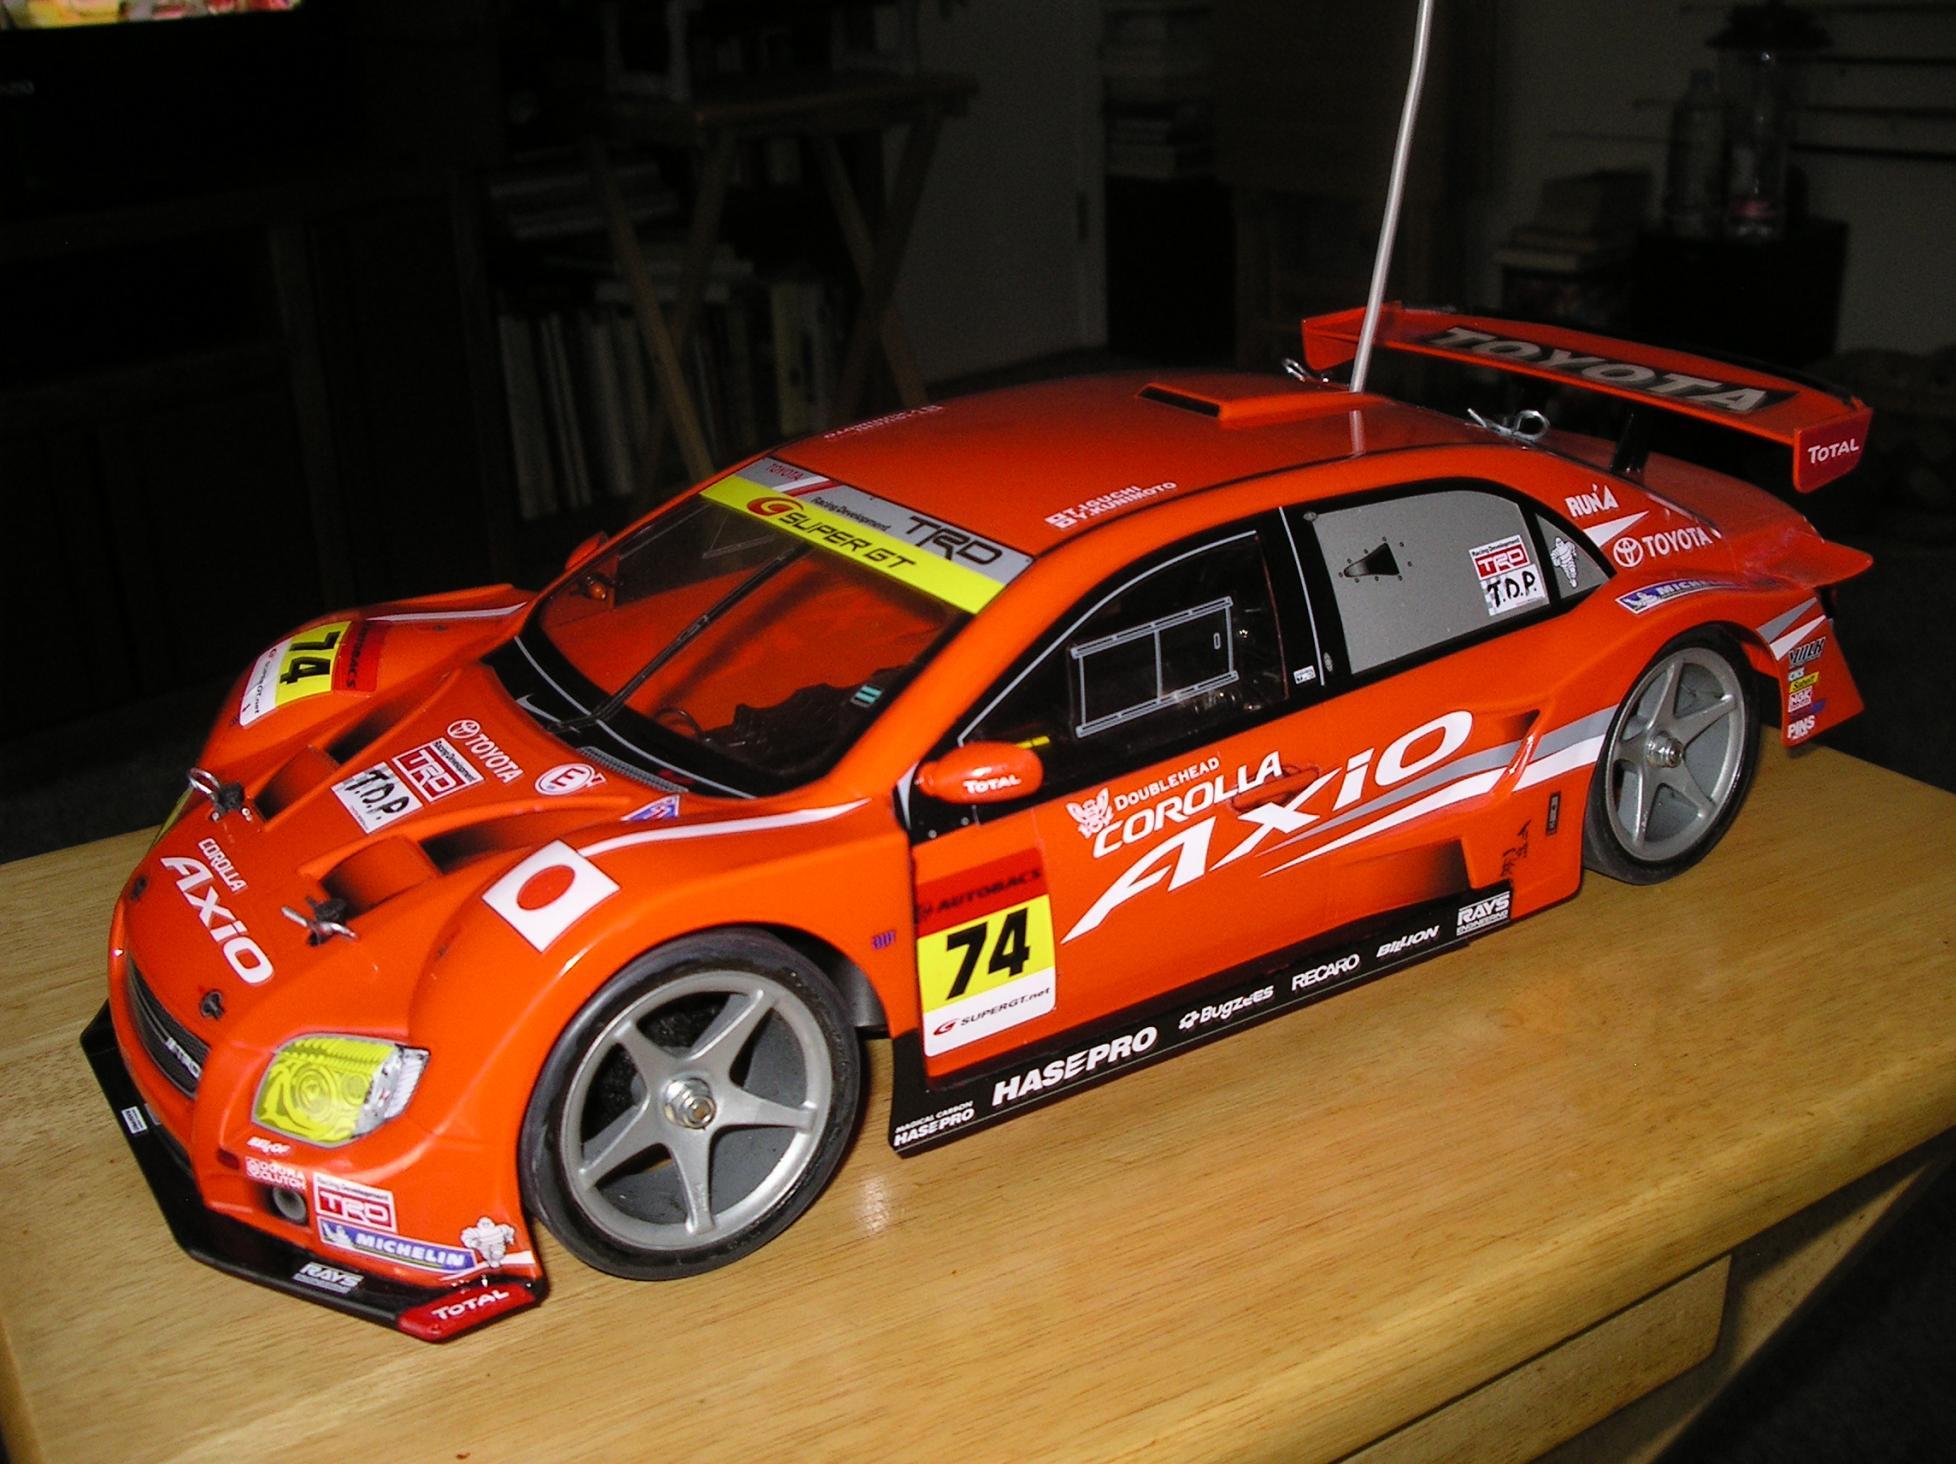 Best Car Paint >> Best Tamiya Touring Car Body Shell?? - R/C Tech Forums